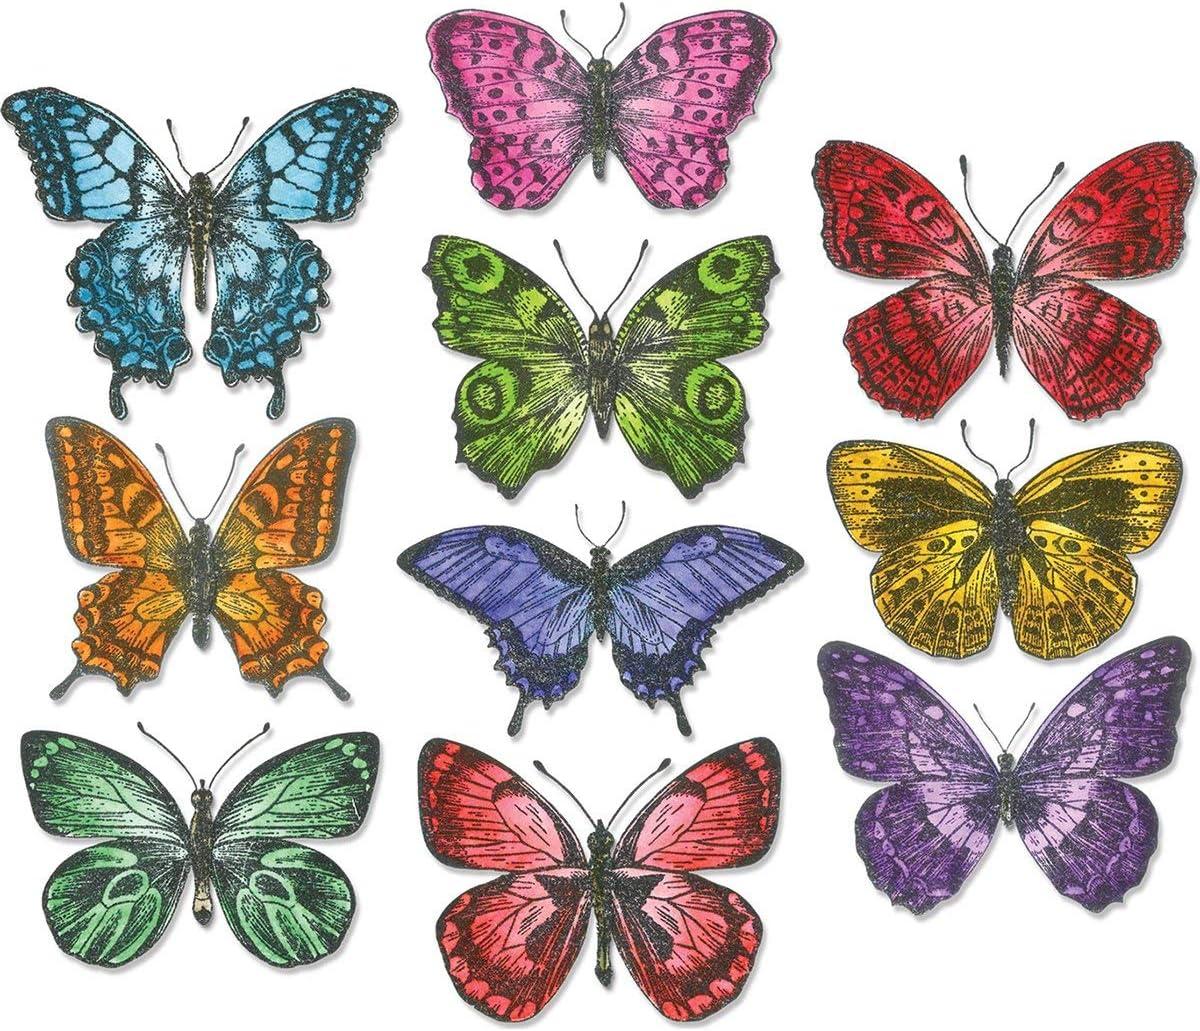 Sizzix Die Set 20 Pack One Size Framelits Multicolor Multi Color Flutter by Tim Holtz